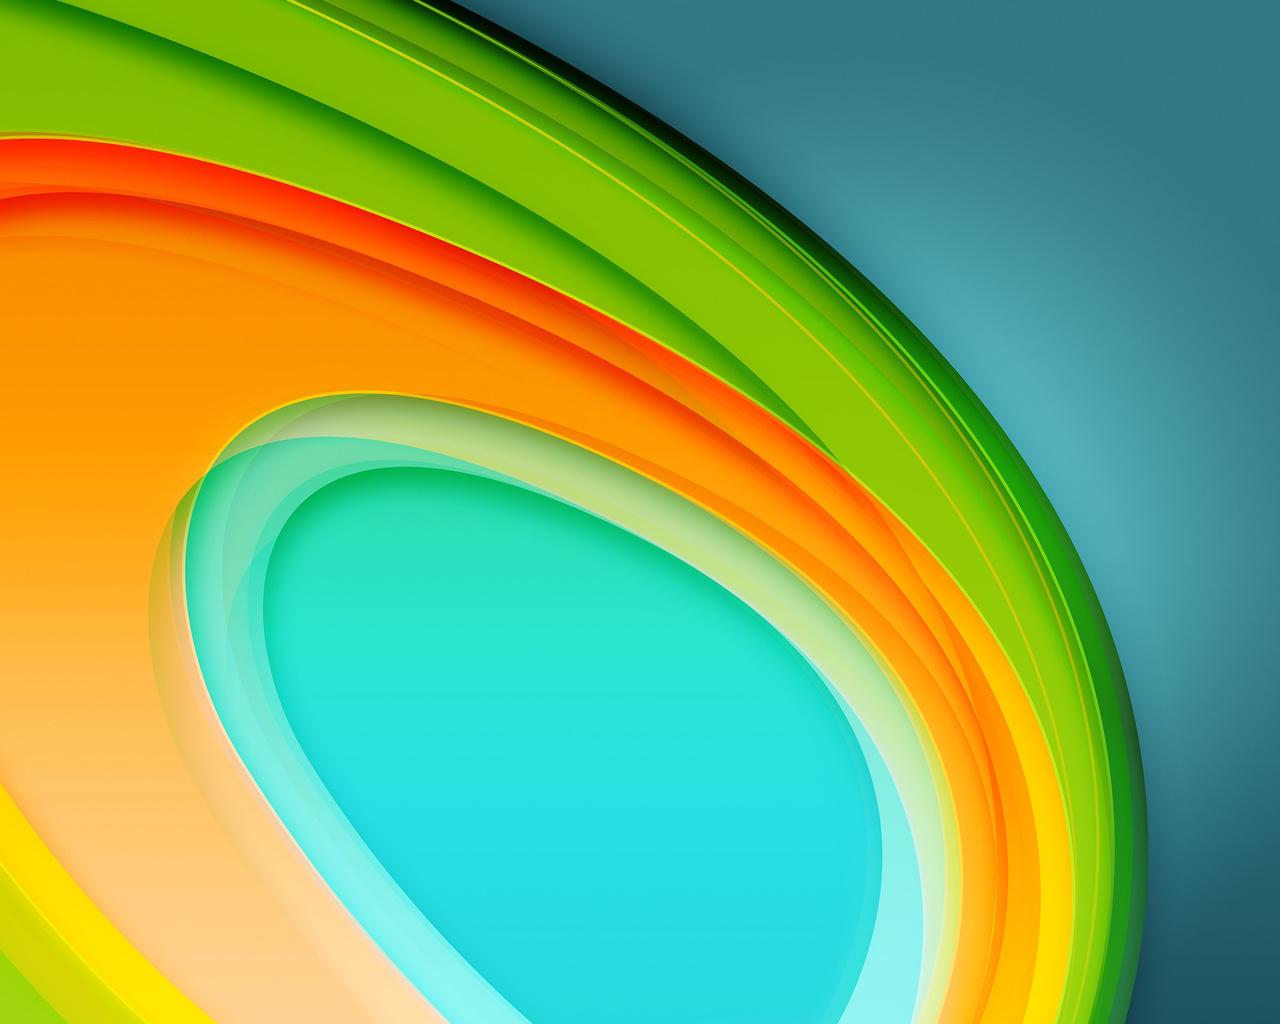 Colorful Circles 4K 5K (1280x1024)